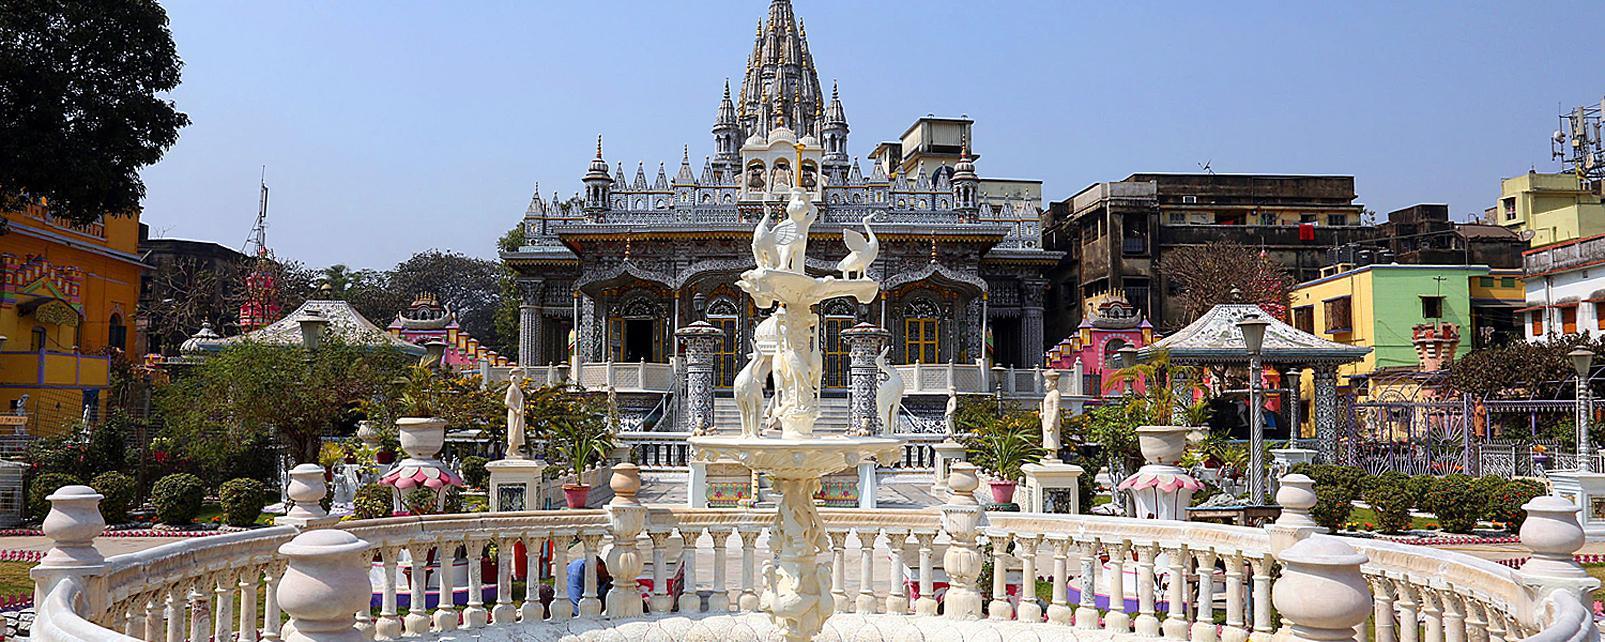 Asie; Inde; Inde de l'Est; Calcutta;